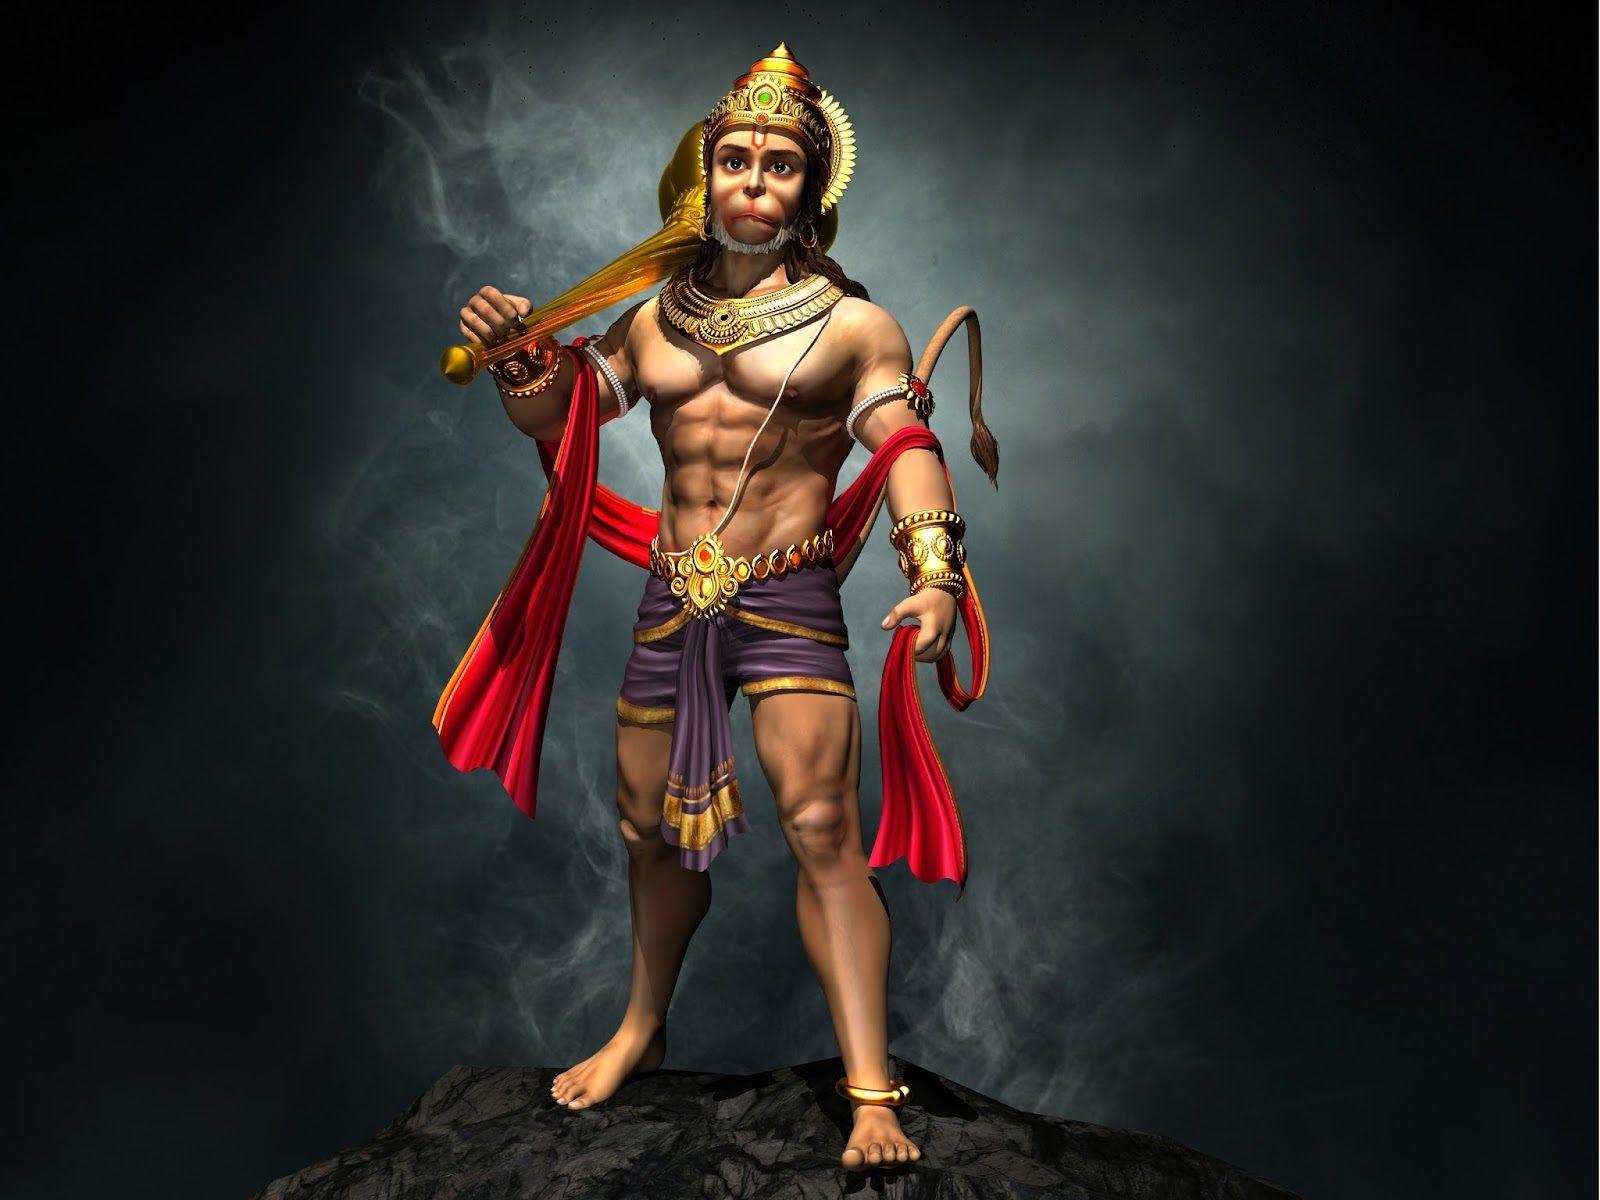 Pin By Rajkumar On God Images Hanuman Images Hanuman Images Hd Hanuman Photos